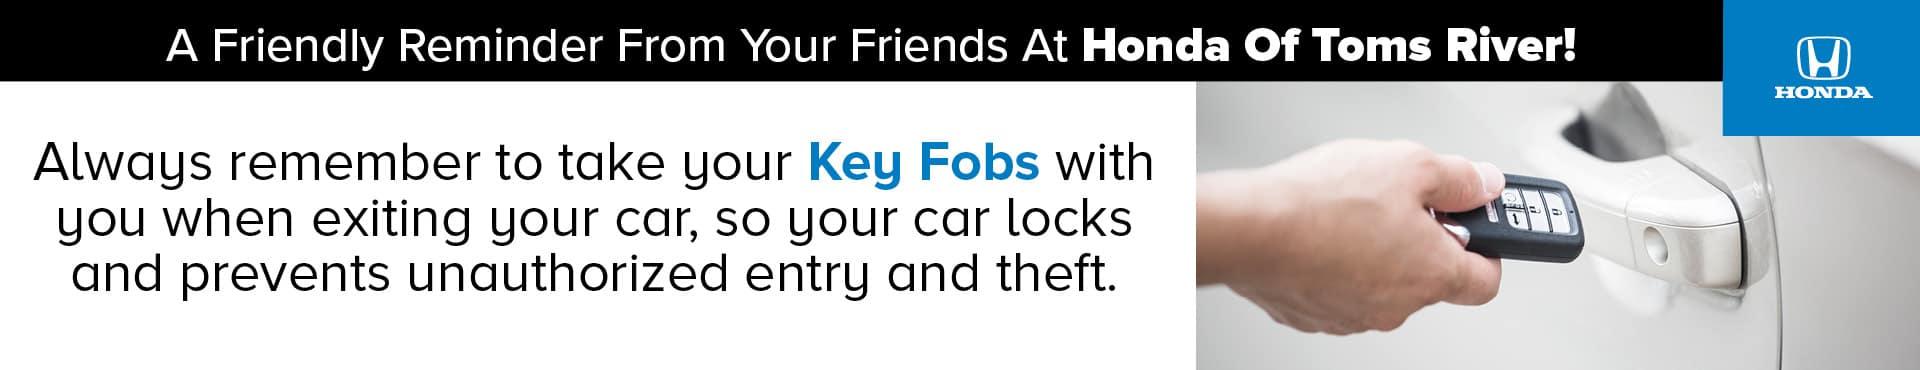 HOTR-1185 Key Fob reminder website social banners5